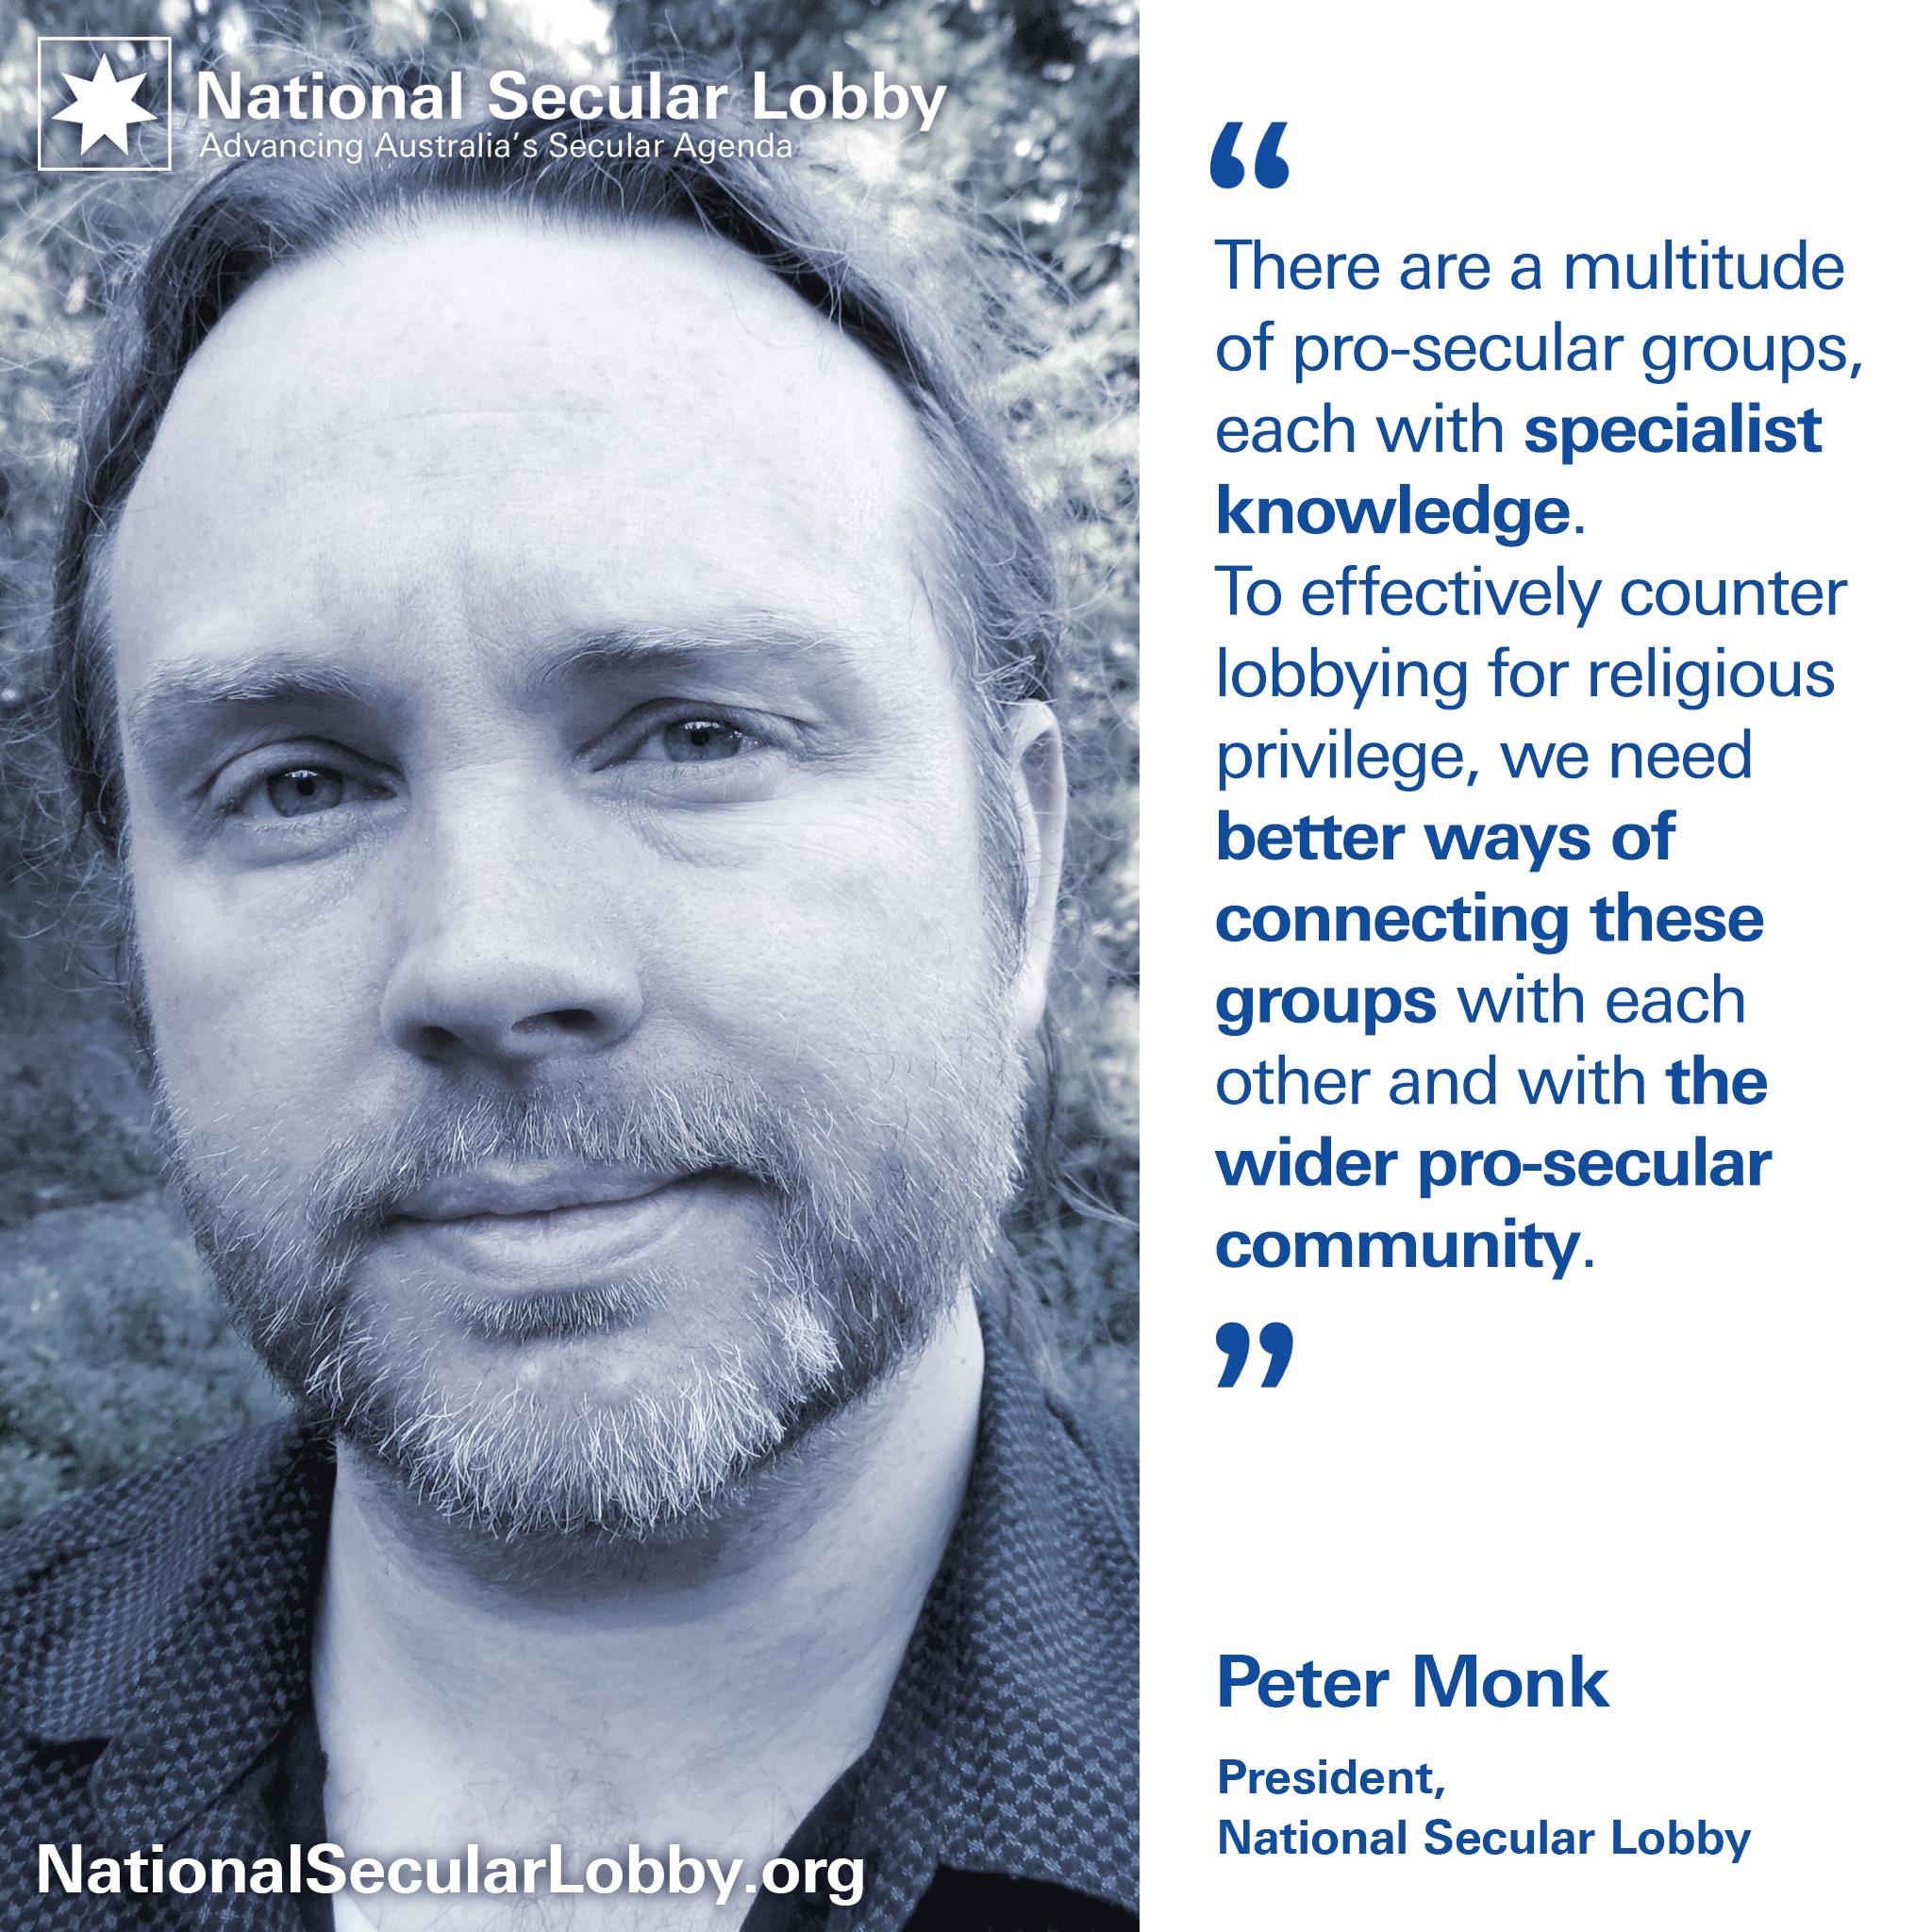 NSL President Peter Monk